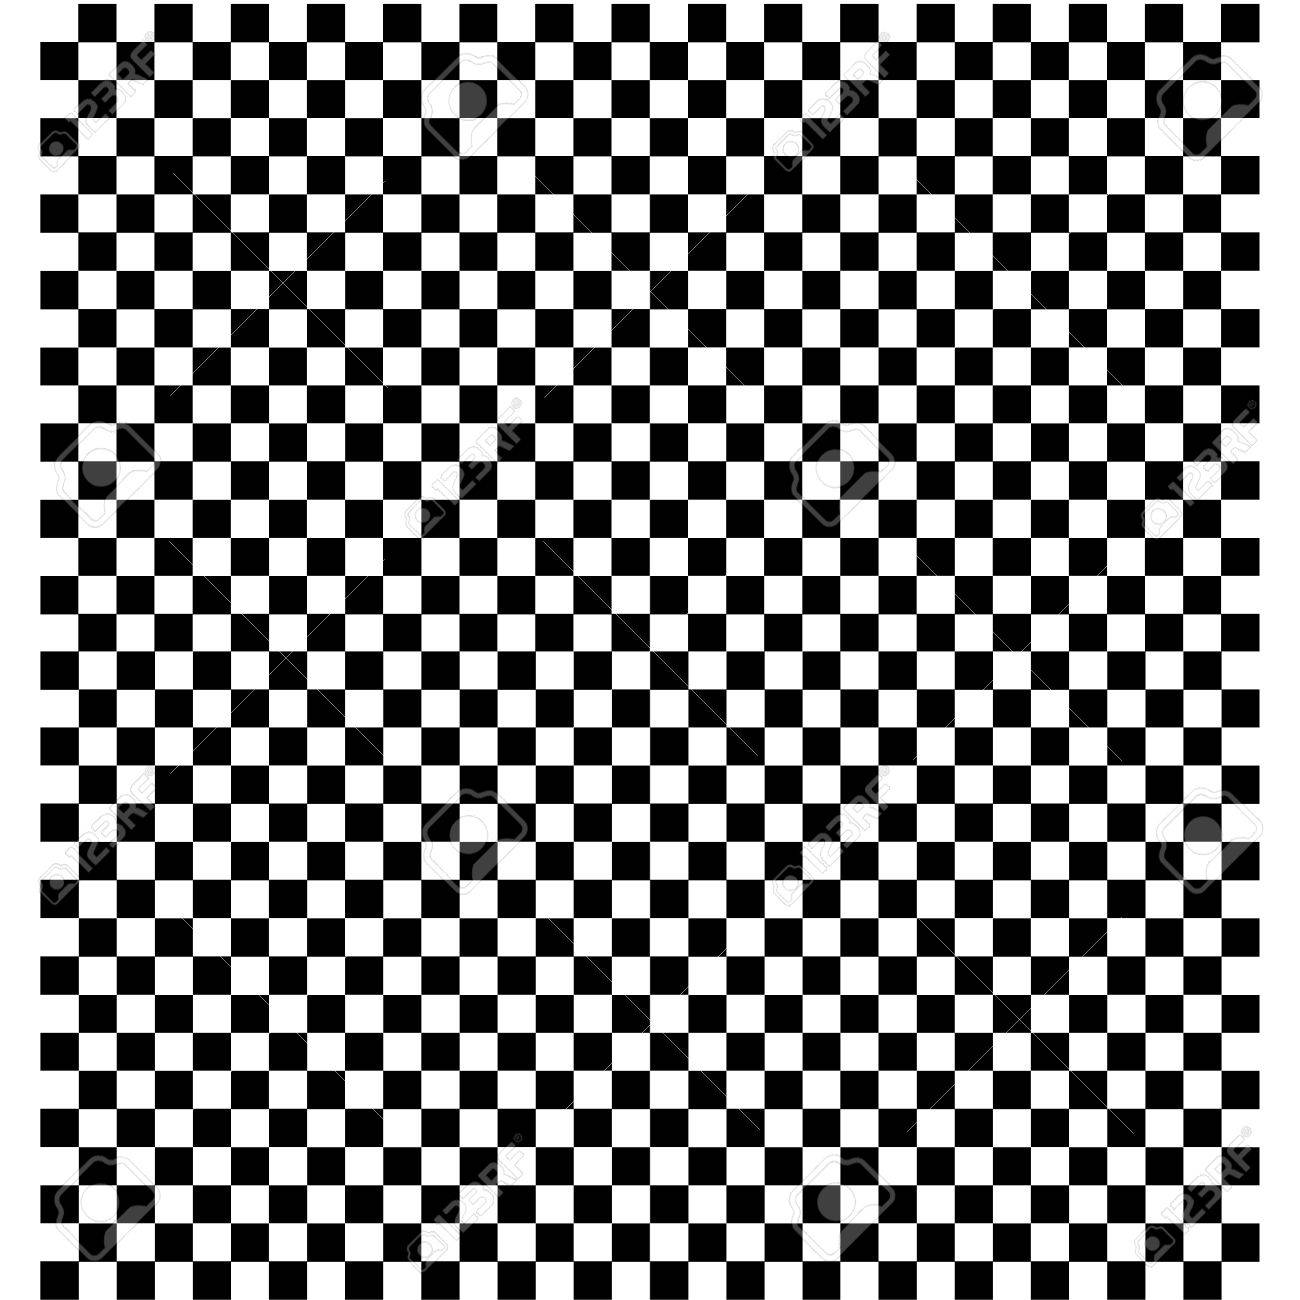 Black and White Checkered background.